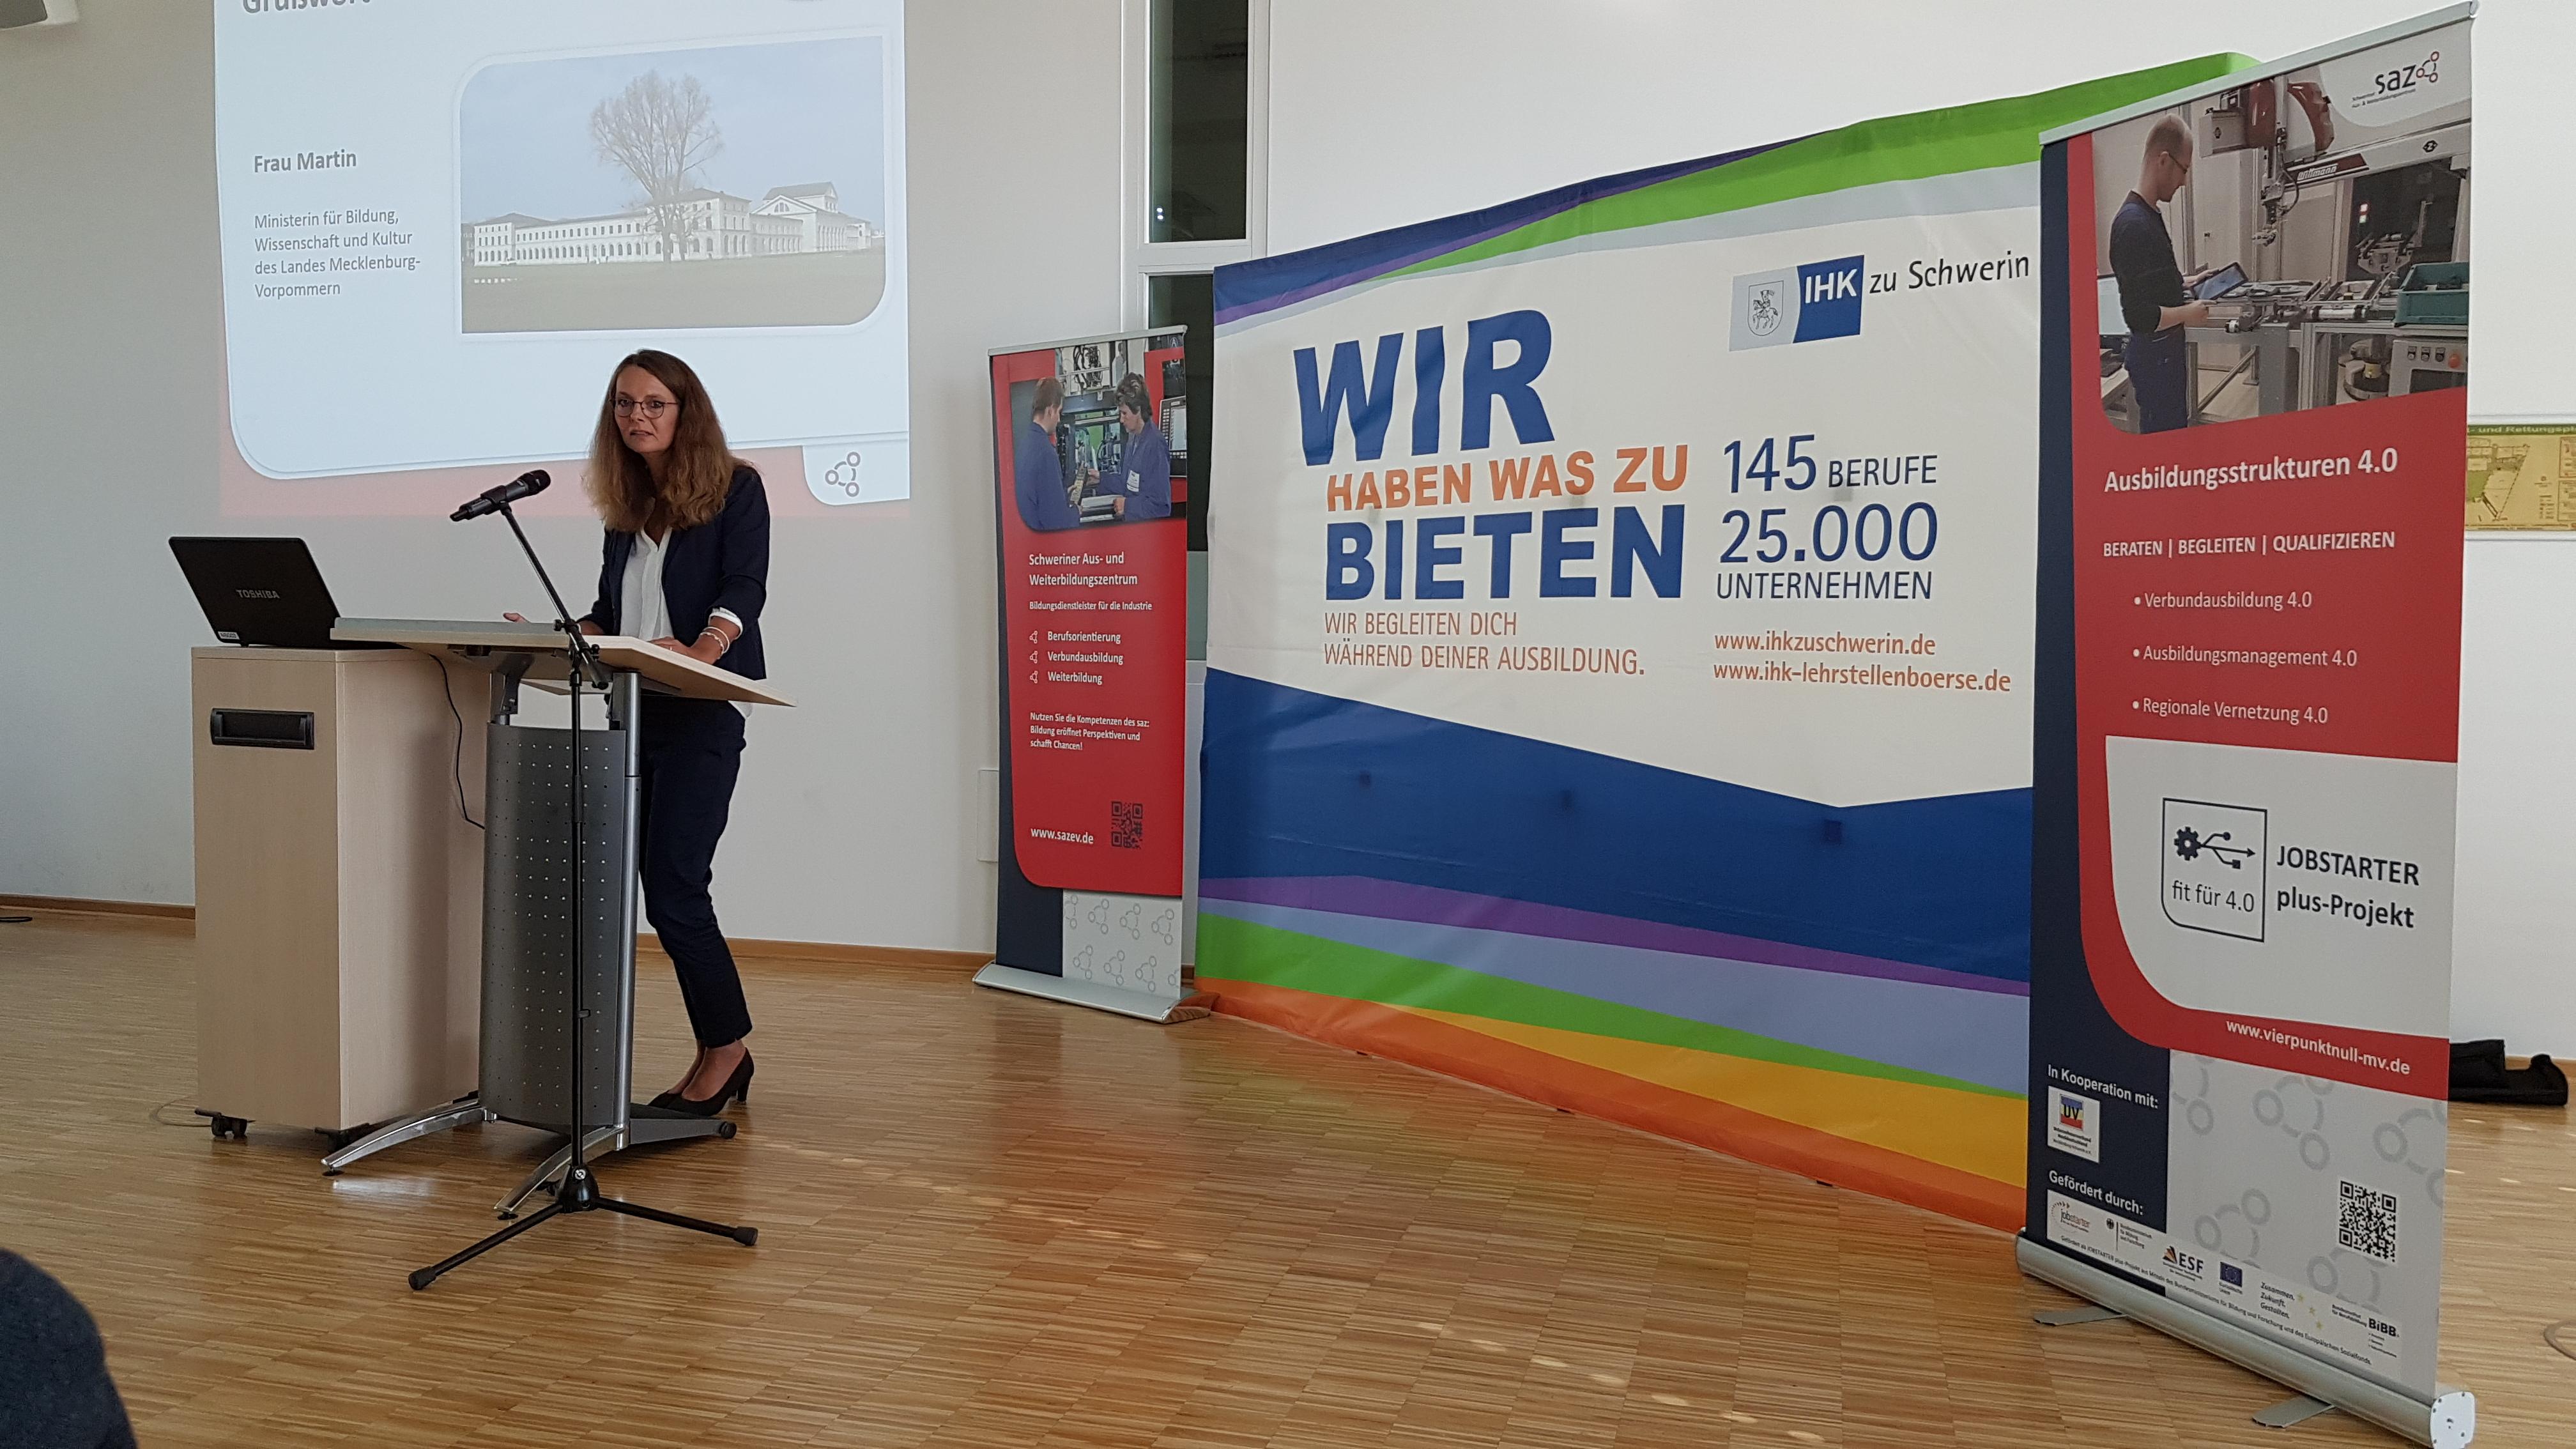 2019-09-02_Lehrjahreseröffnung-2019_Bettina-Martin-Bildungsministerin_1